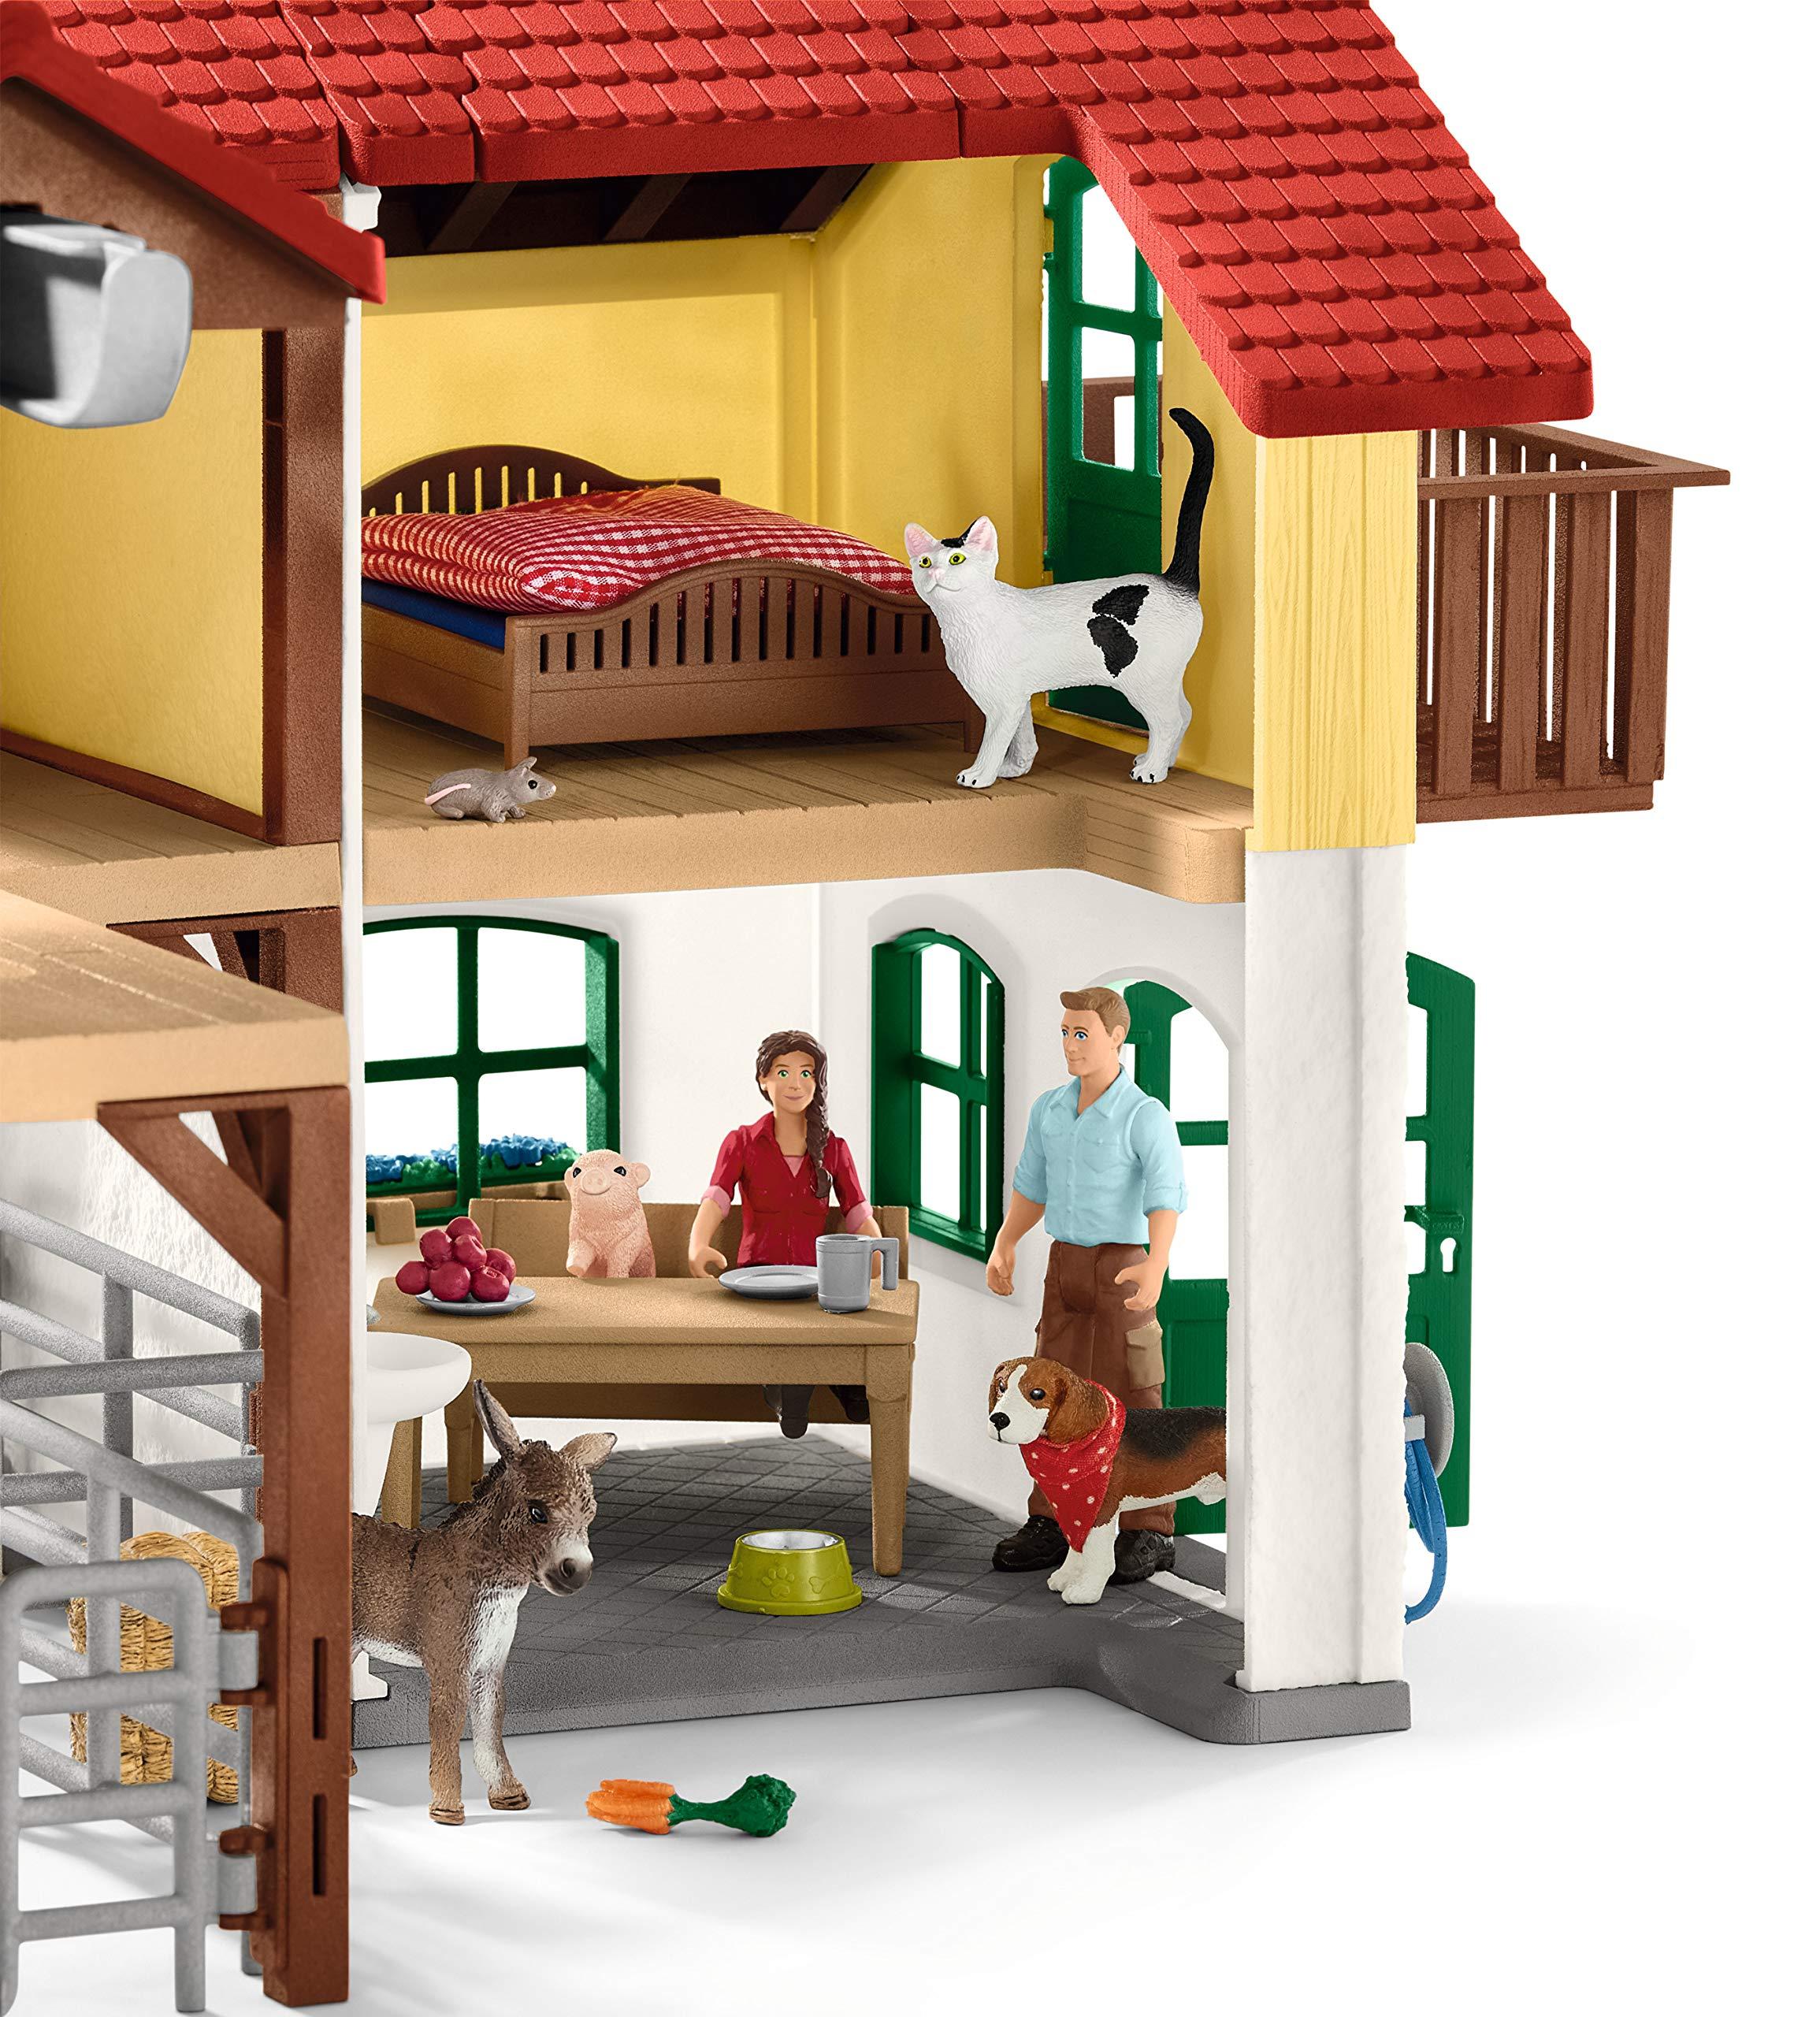 Schleich Large Farm House by Schleich (Image #5)